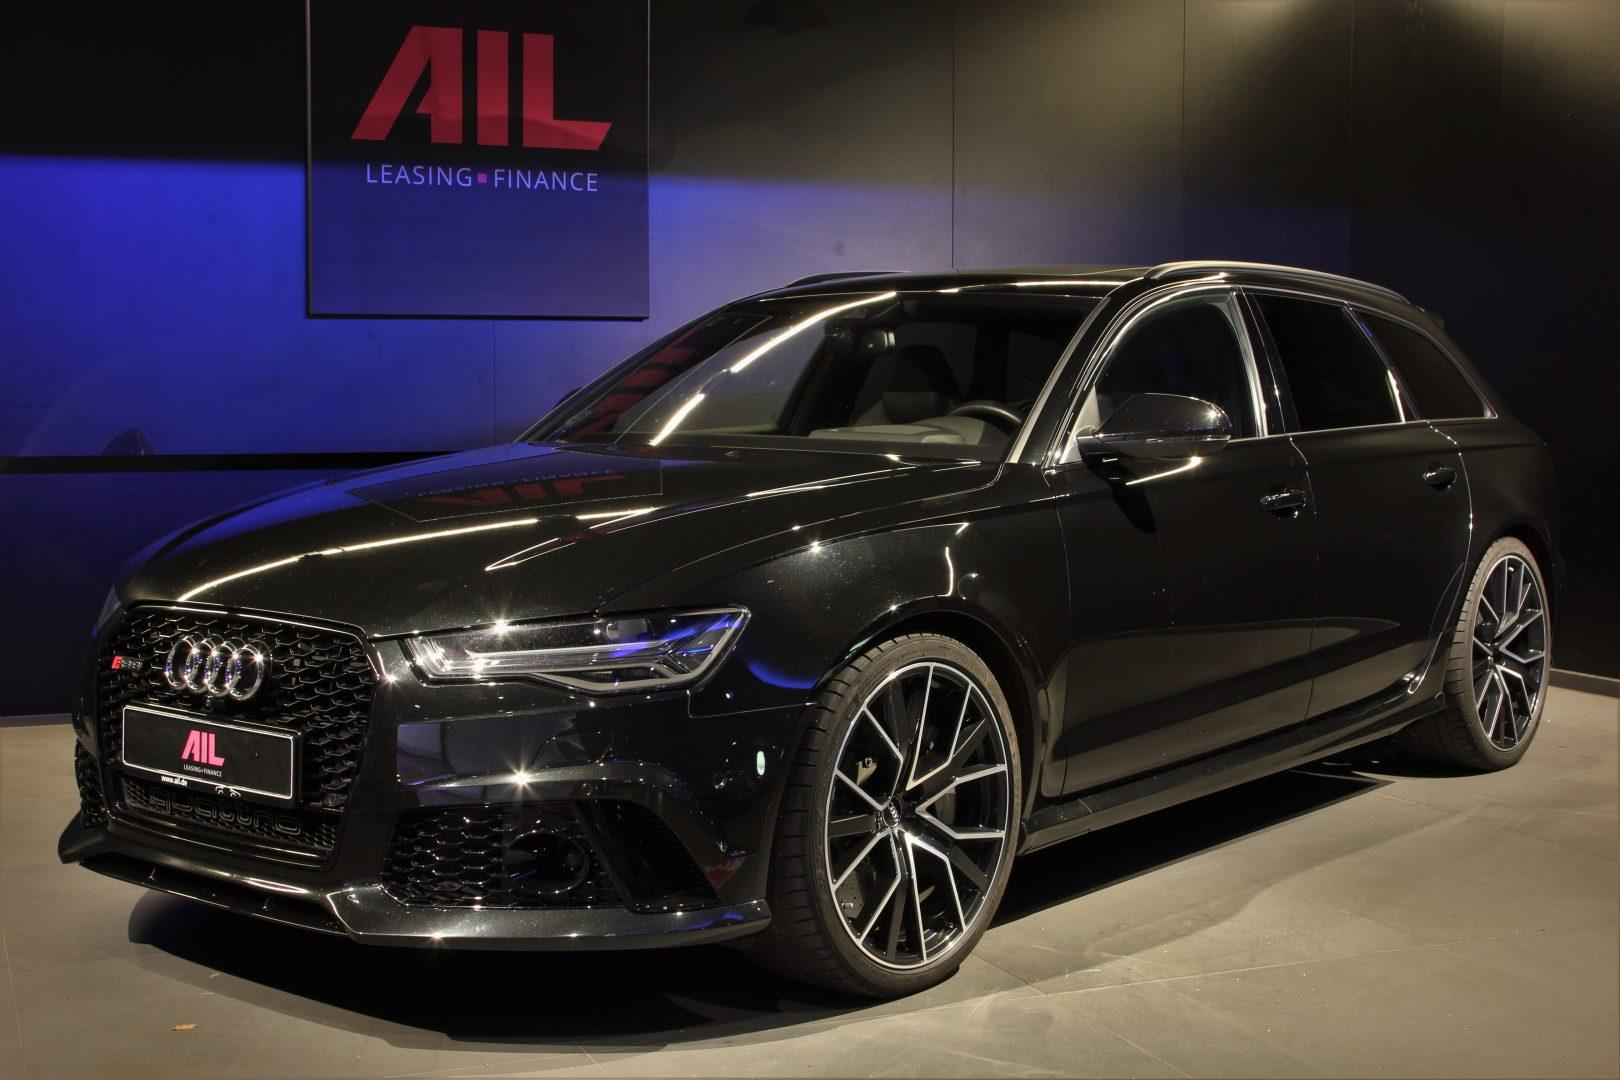 AIL Audi RS6 Avant Performance 4.0 TFSI Carbon Paket  10